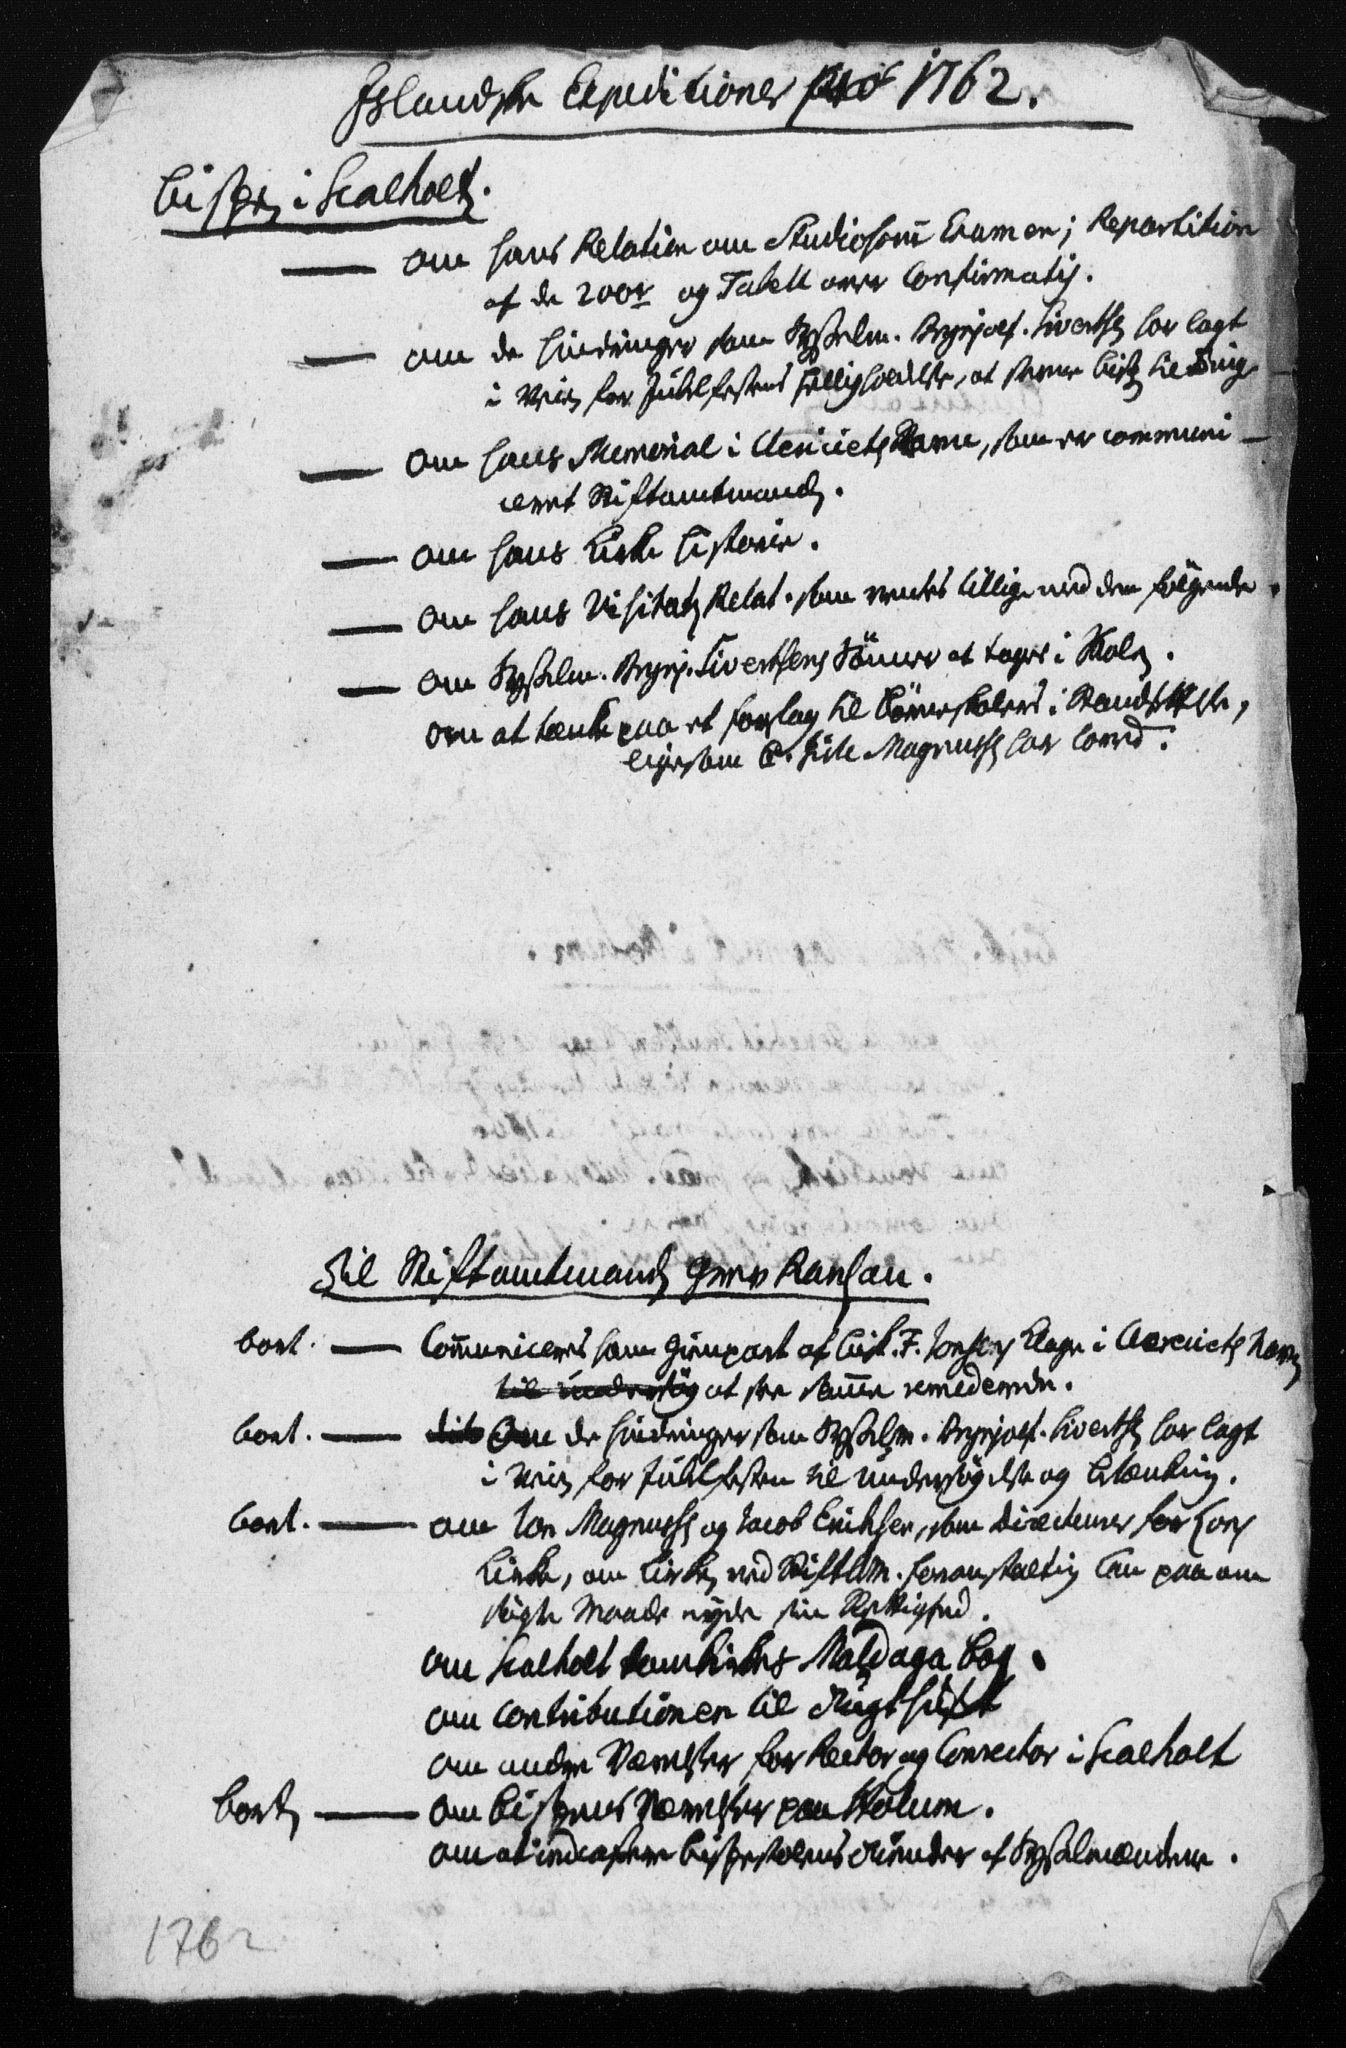 DRA, Generalkirkeinspektionskollegiet, F4-04/F4-04-02: Deliberation, koncepter og ekstrakter, 1754-1762